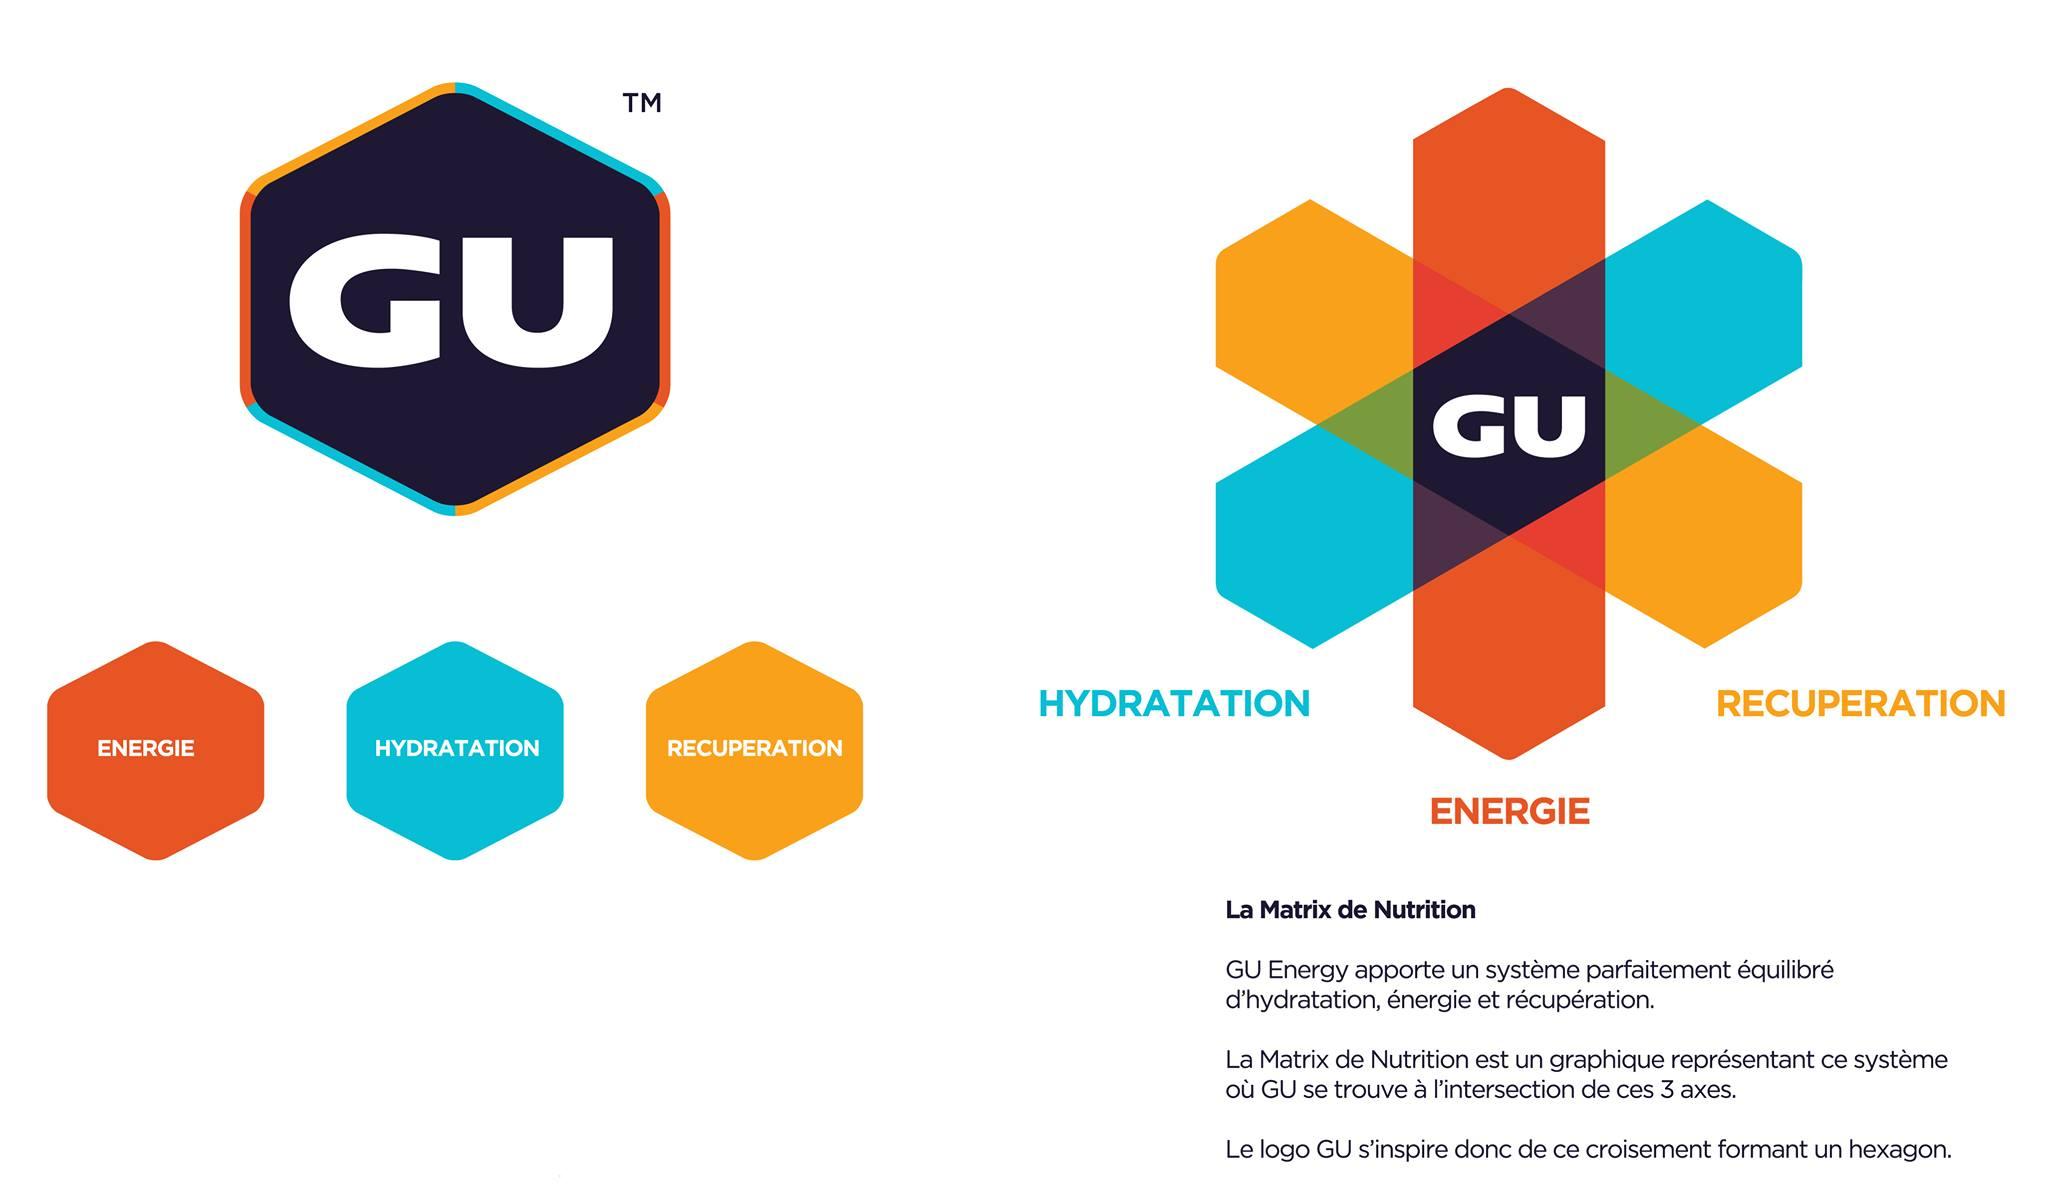 guenergy-newbrand-guforit-matrix-nutrition